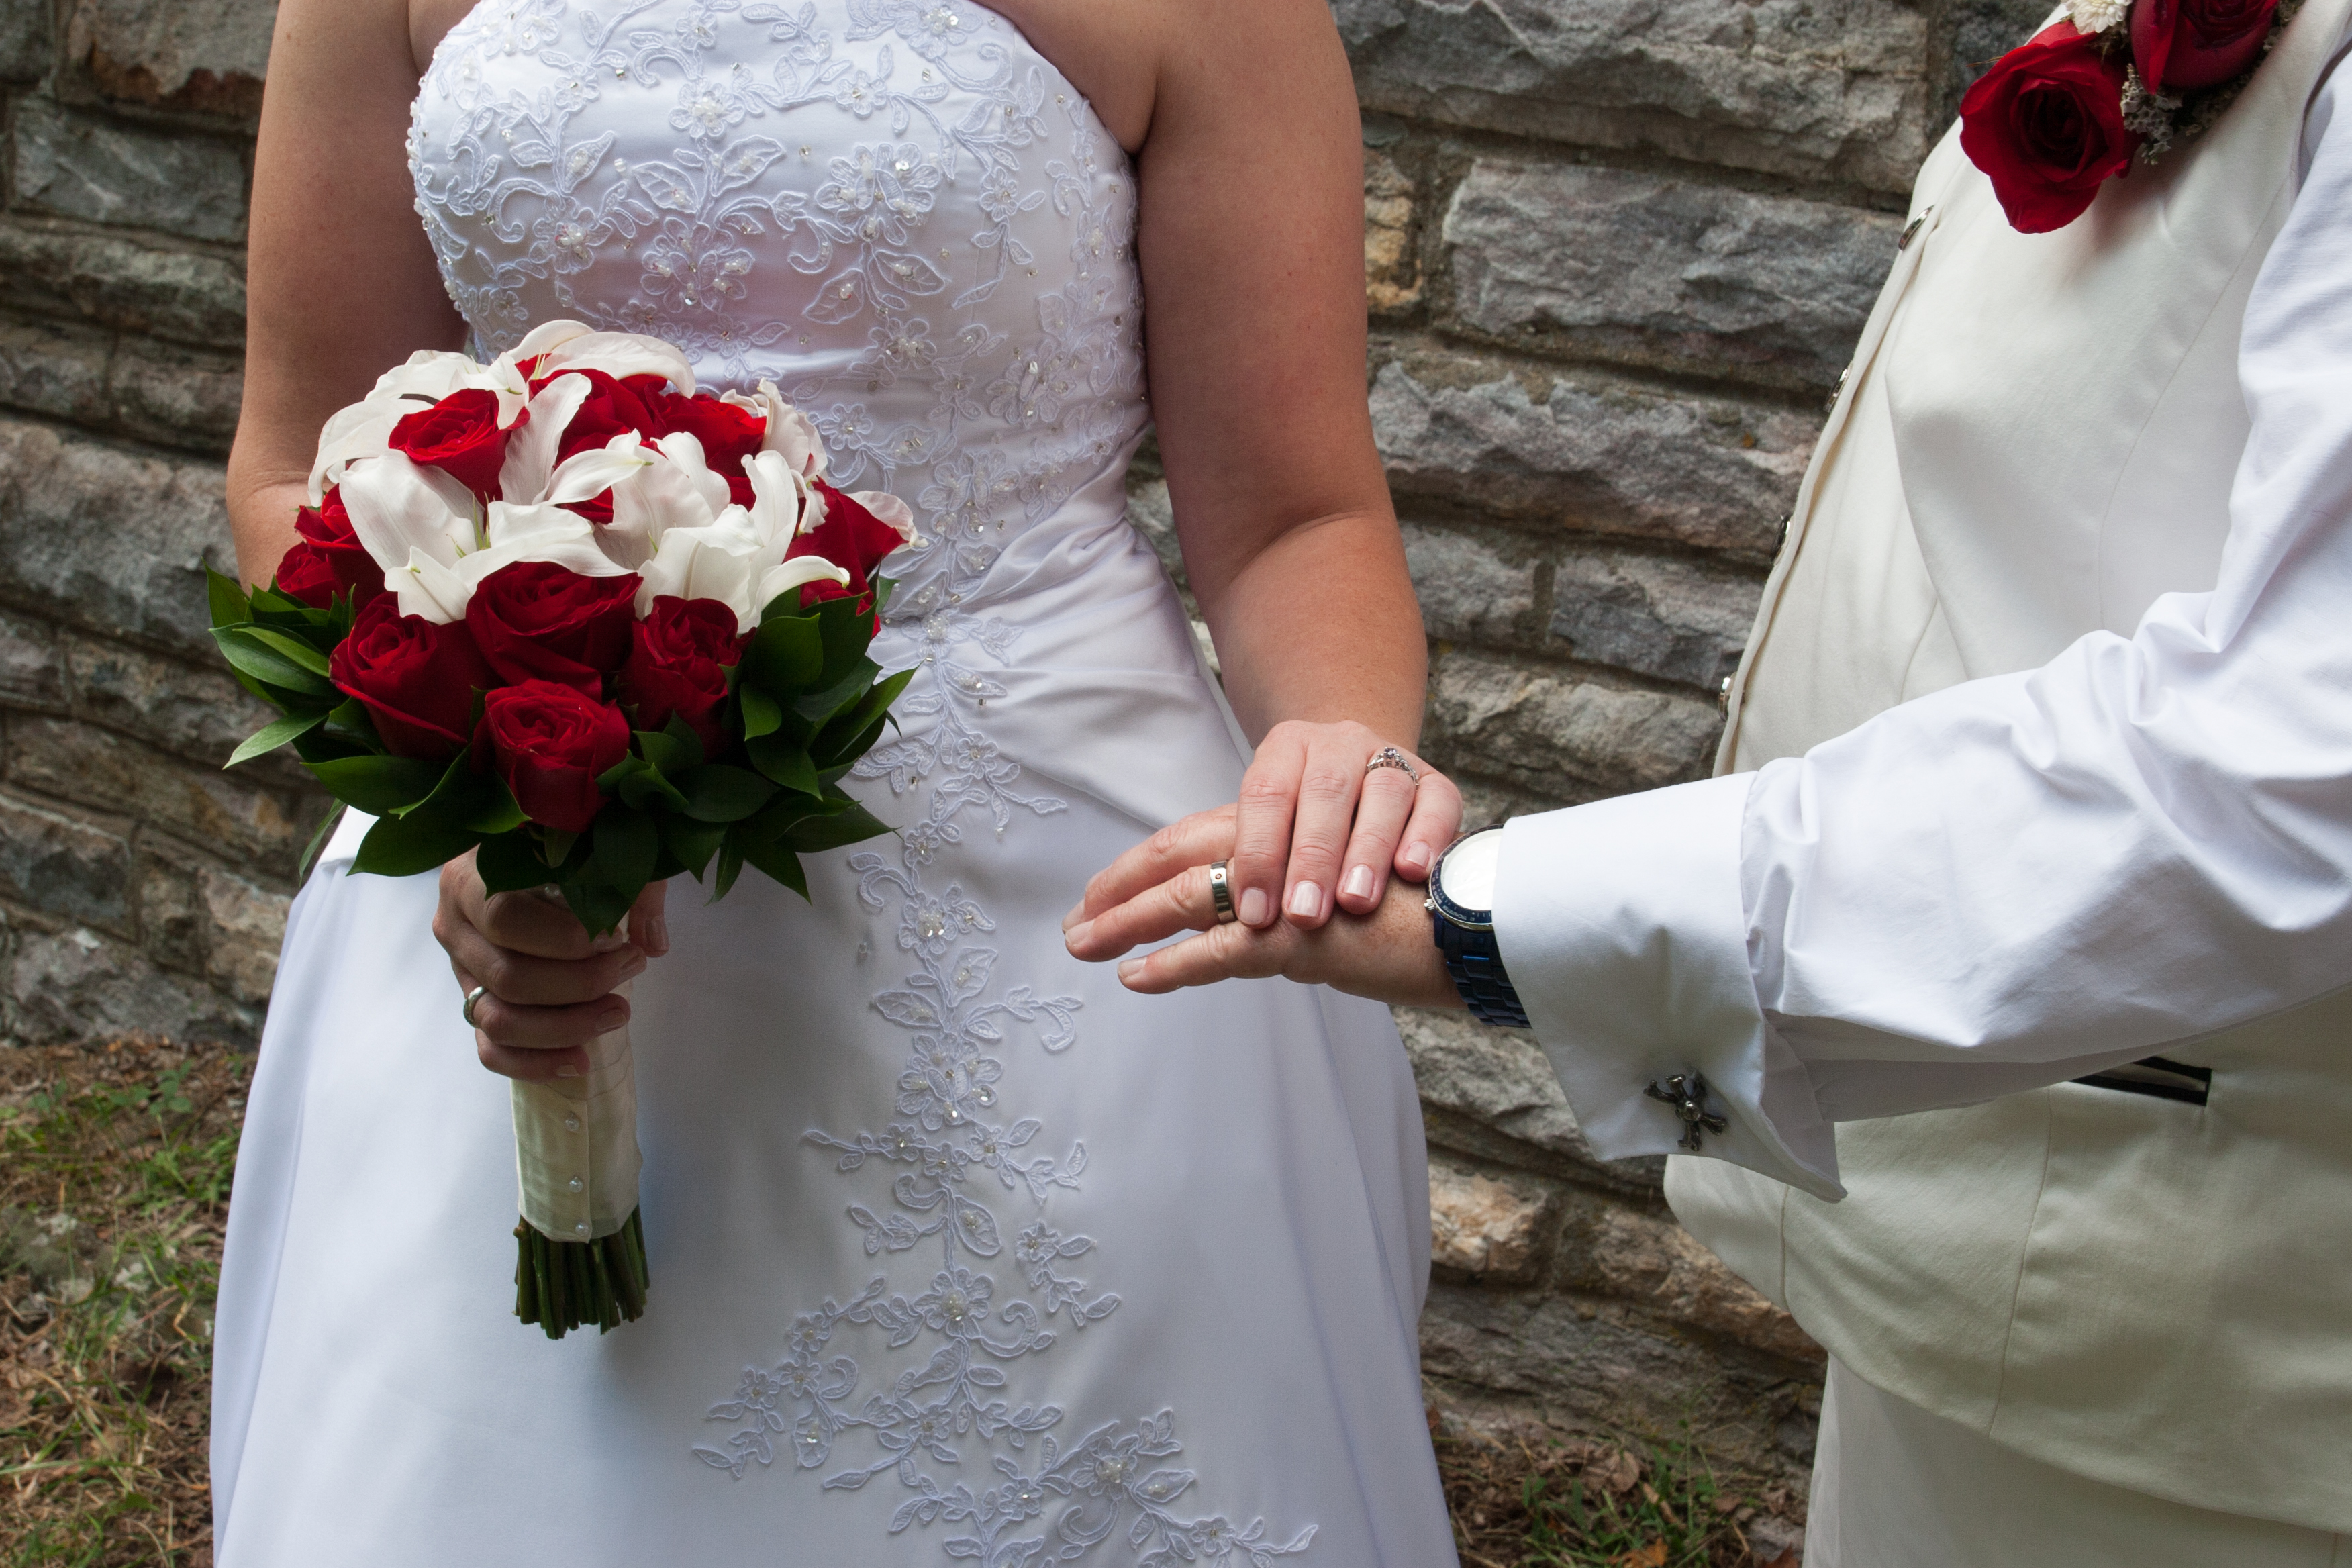 Couple displays wedding rings